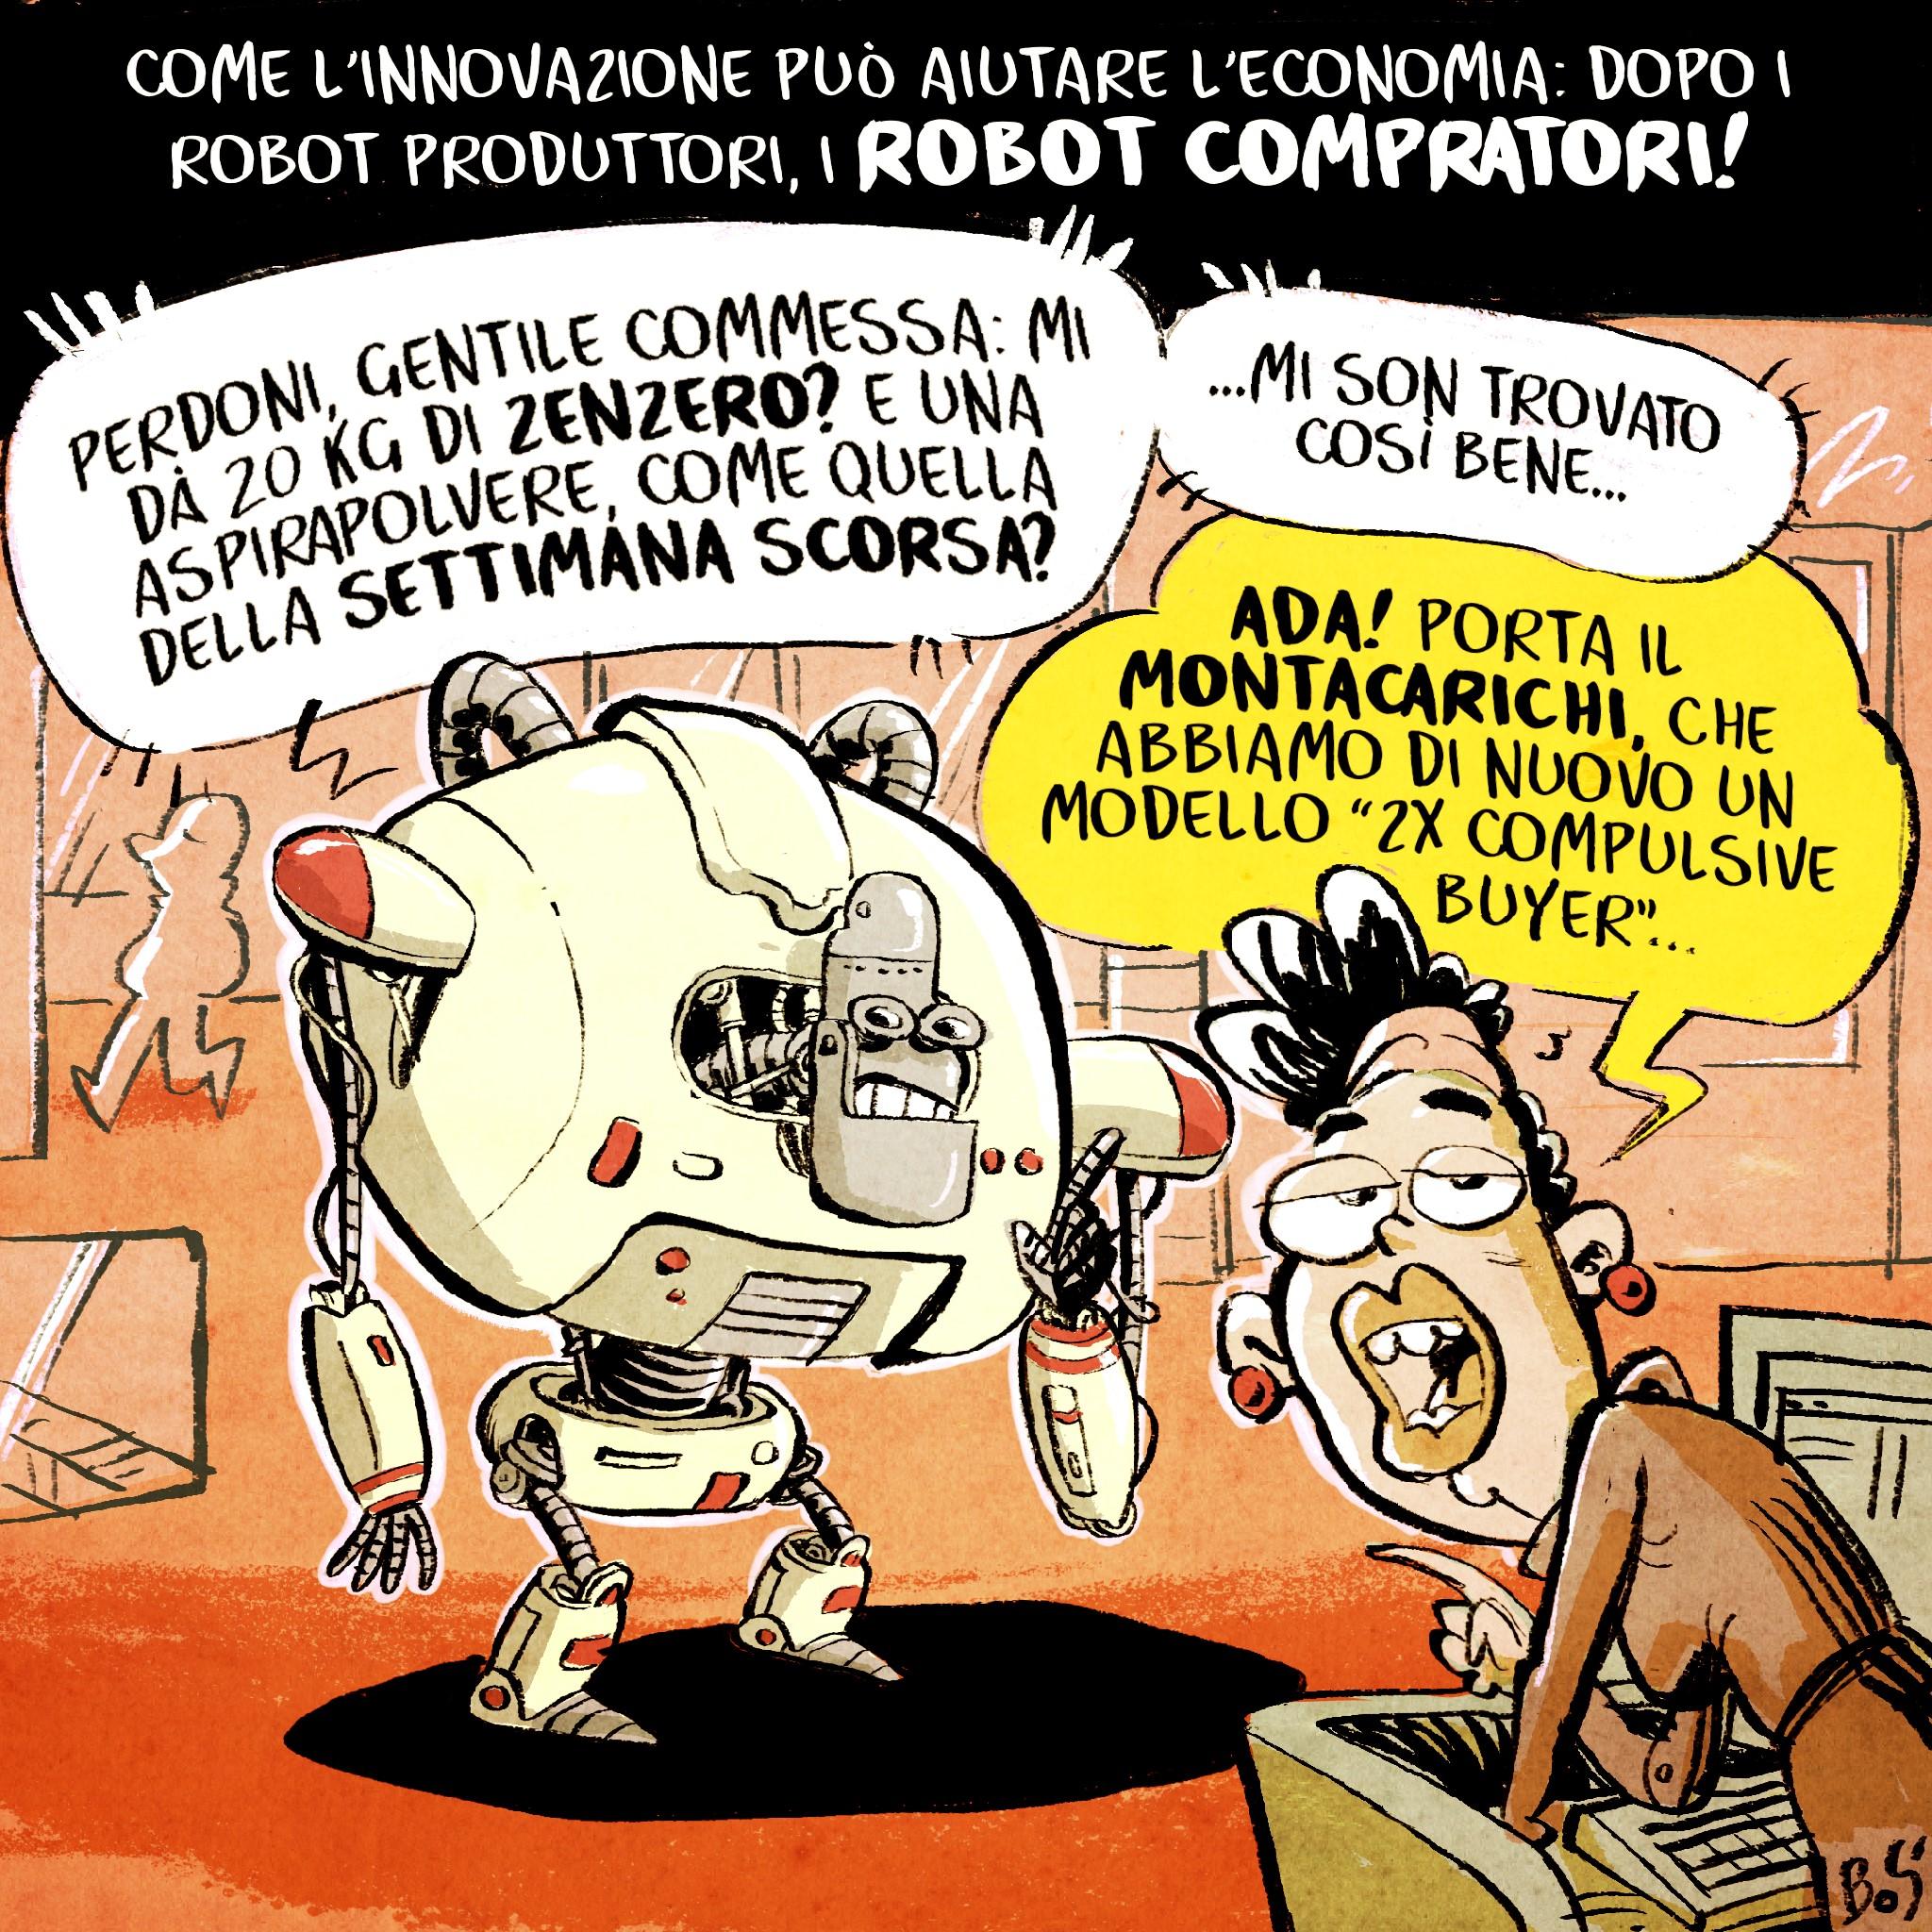 maurizio boscarol vignette e satira